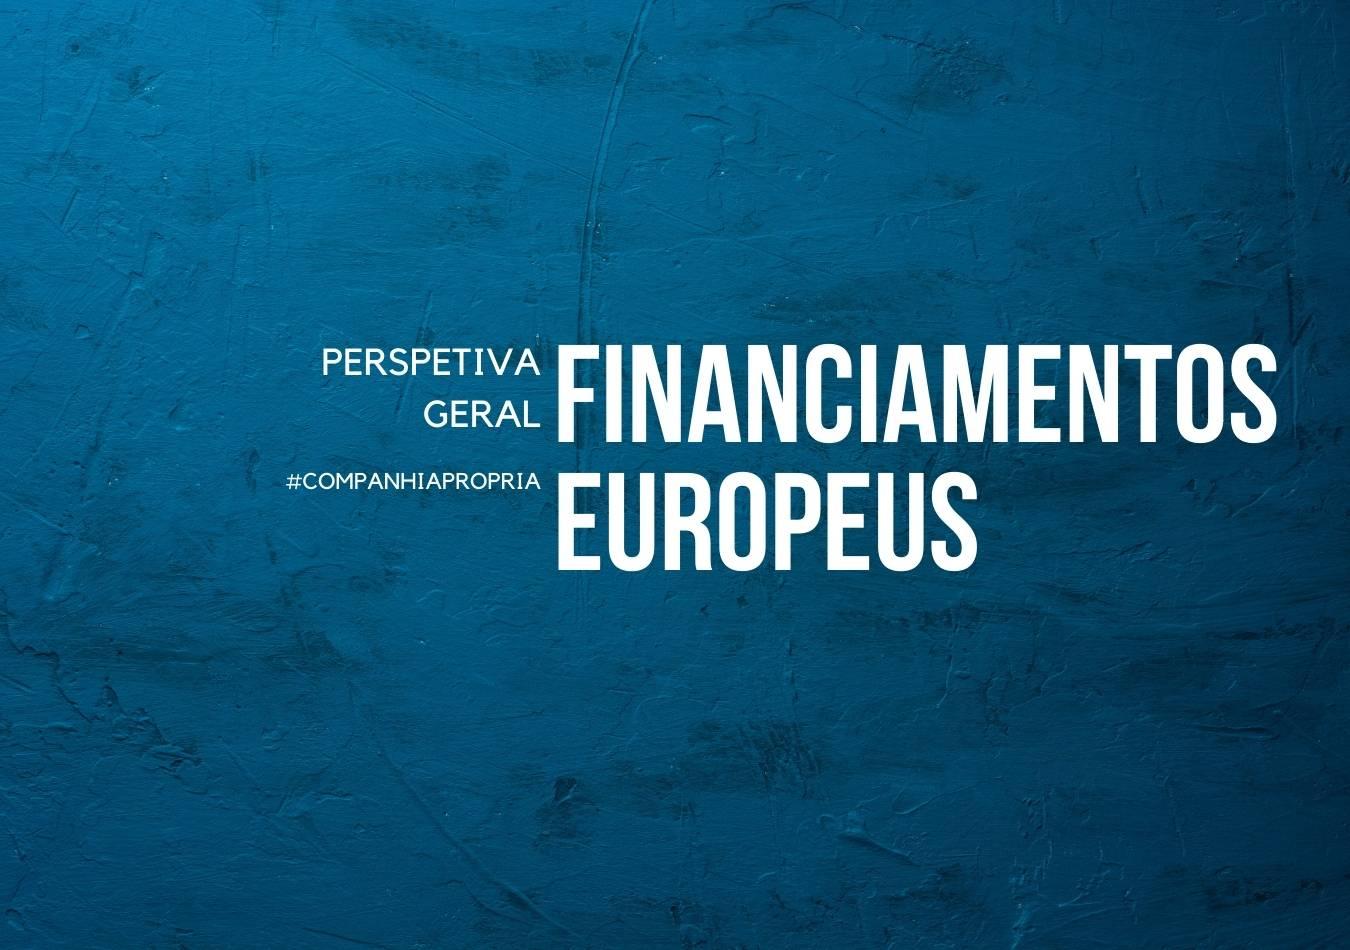 Financiamentos europeus capa